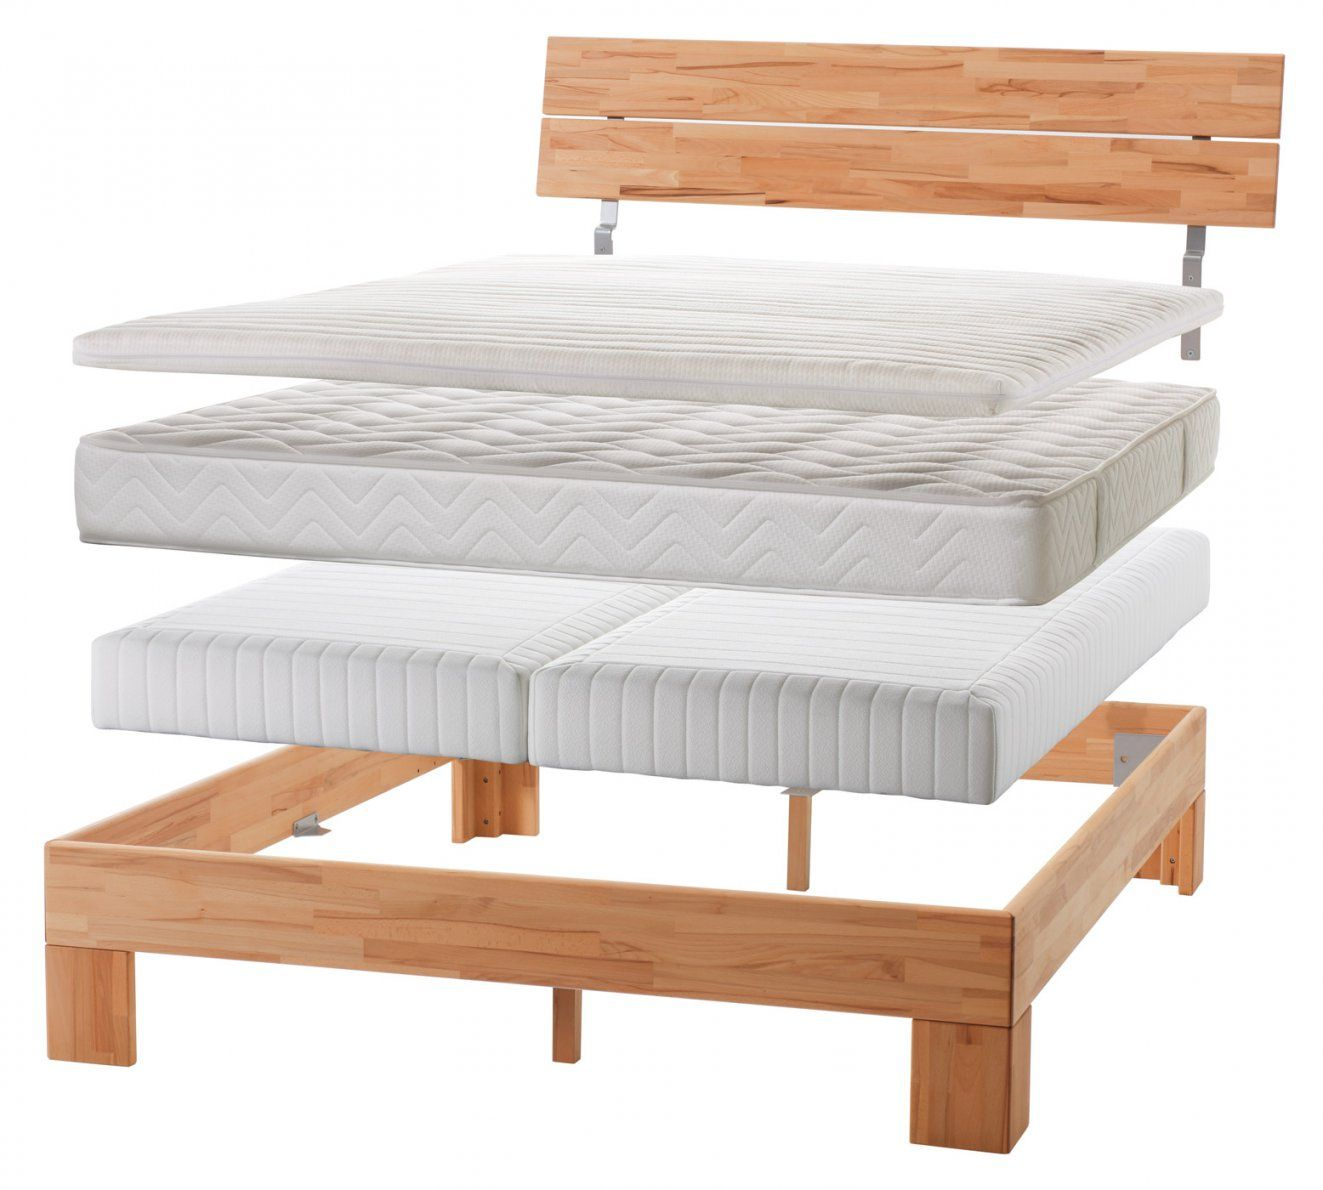 boxspringbett aufbau full size of billig matratze von bett umbauen zum boxspringbett photo. Black Bedroom Furniture Sets. Home Design Ideas